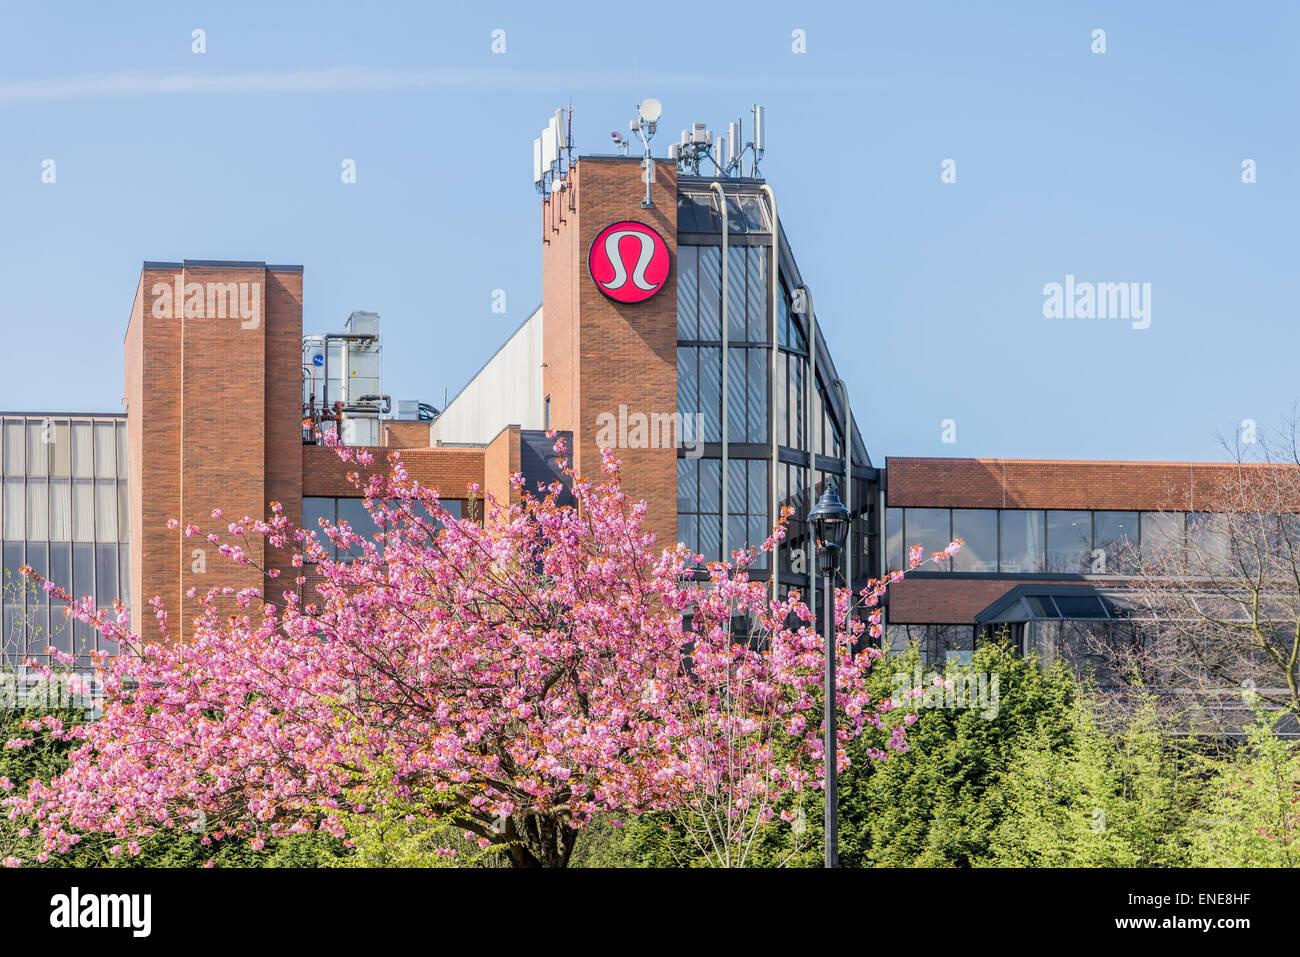 3b38155f08c Lululemon Athletica Headquarters, Vancouver, British Columbia, Canada -  Stock Image